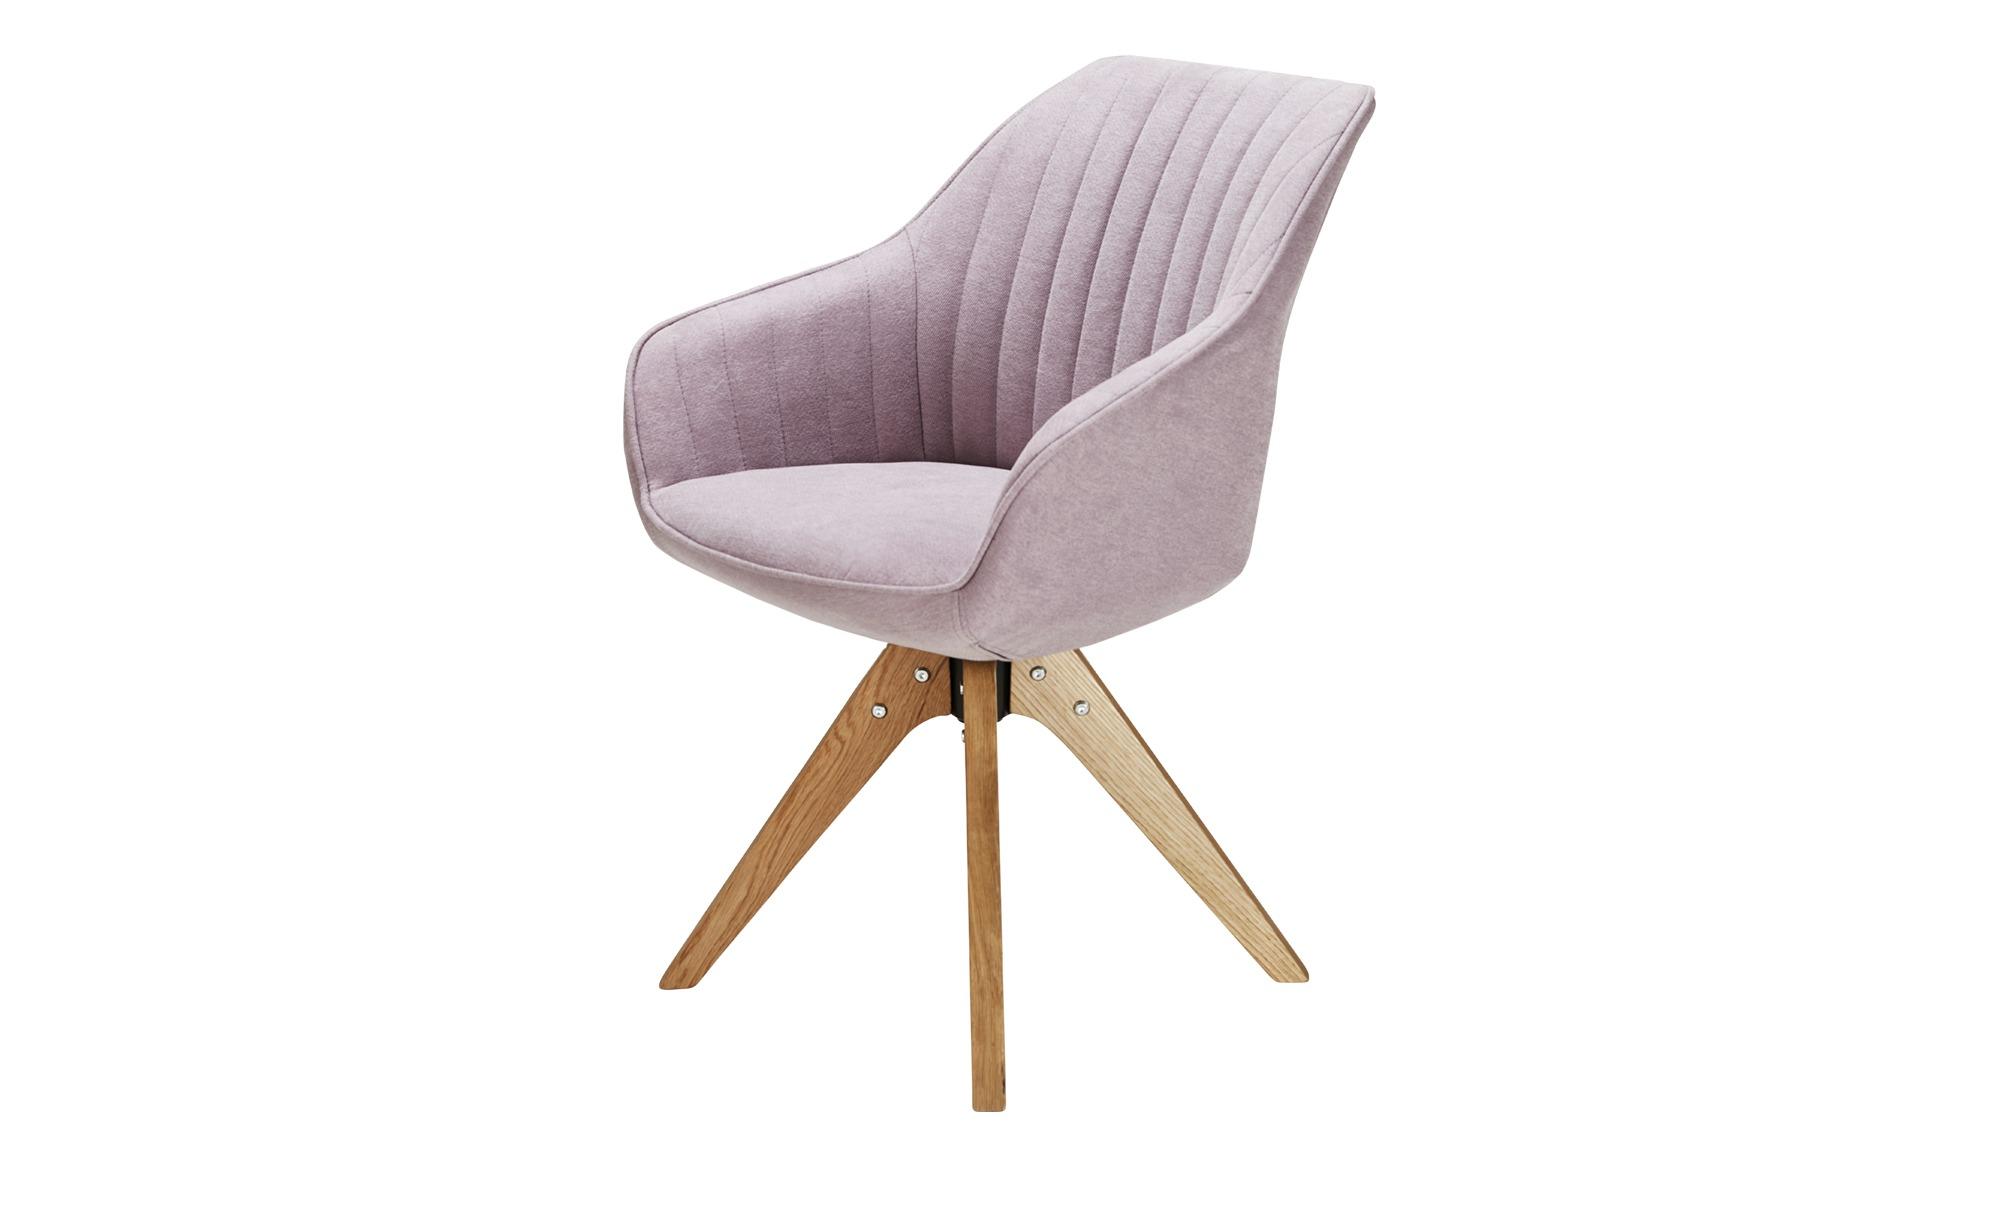 Drehsessel  Relax ¦ lila/violett ¦ Maße (cm): B: 60 H: 83 T: 65 Stühle > Esszimmerstühle > Esszimmerstühle mit Armlehnen - Höffner